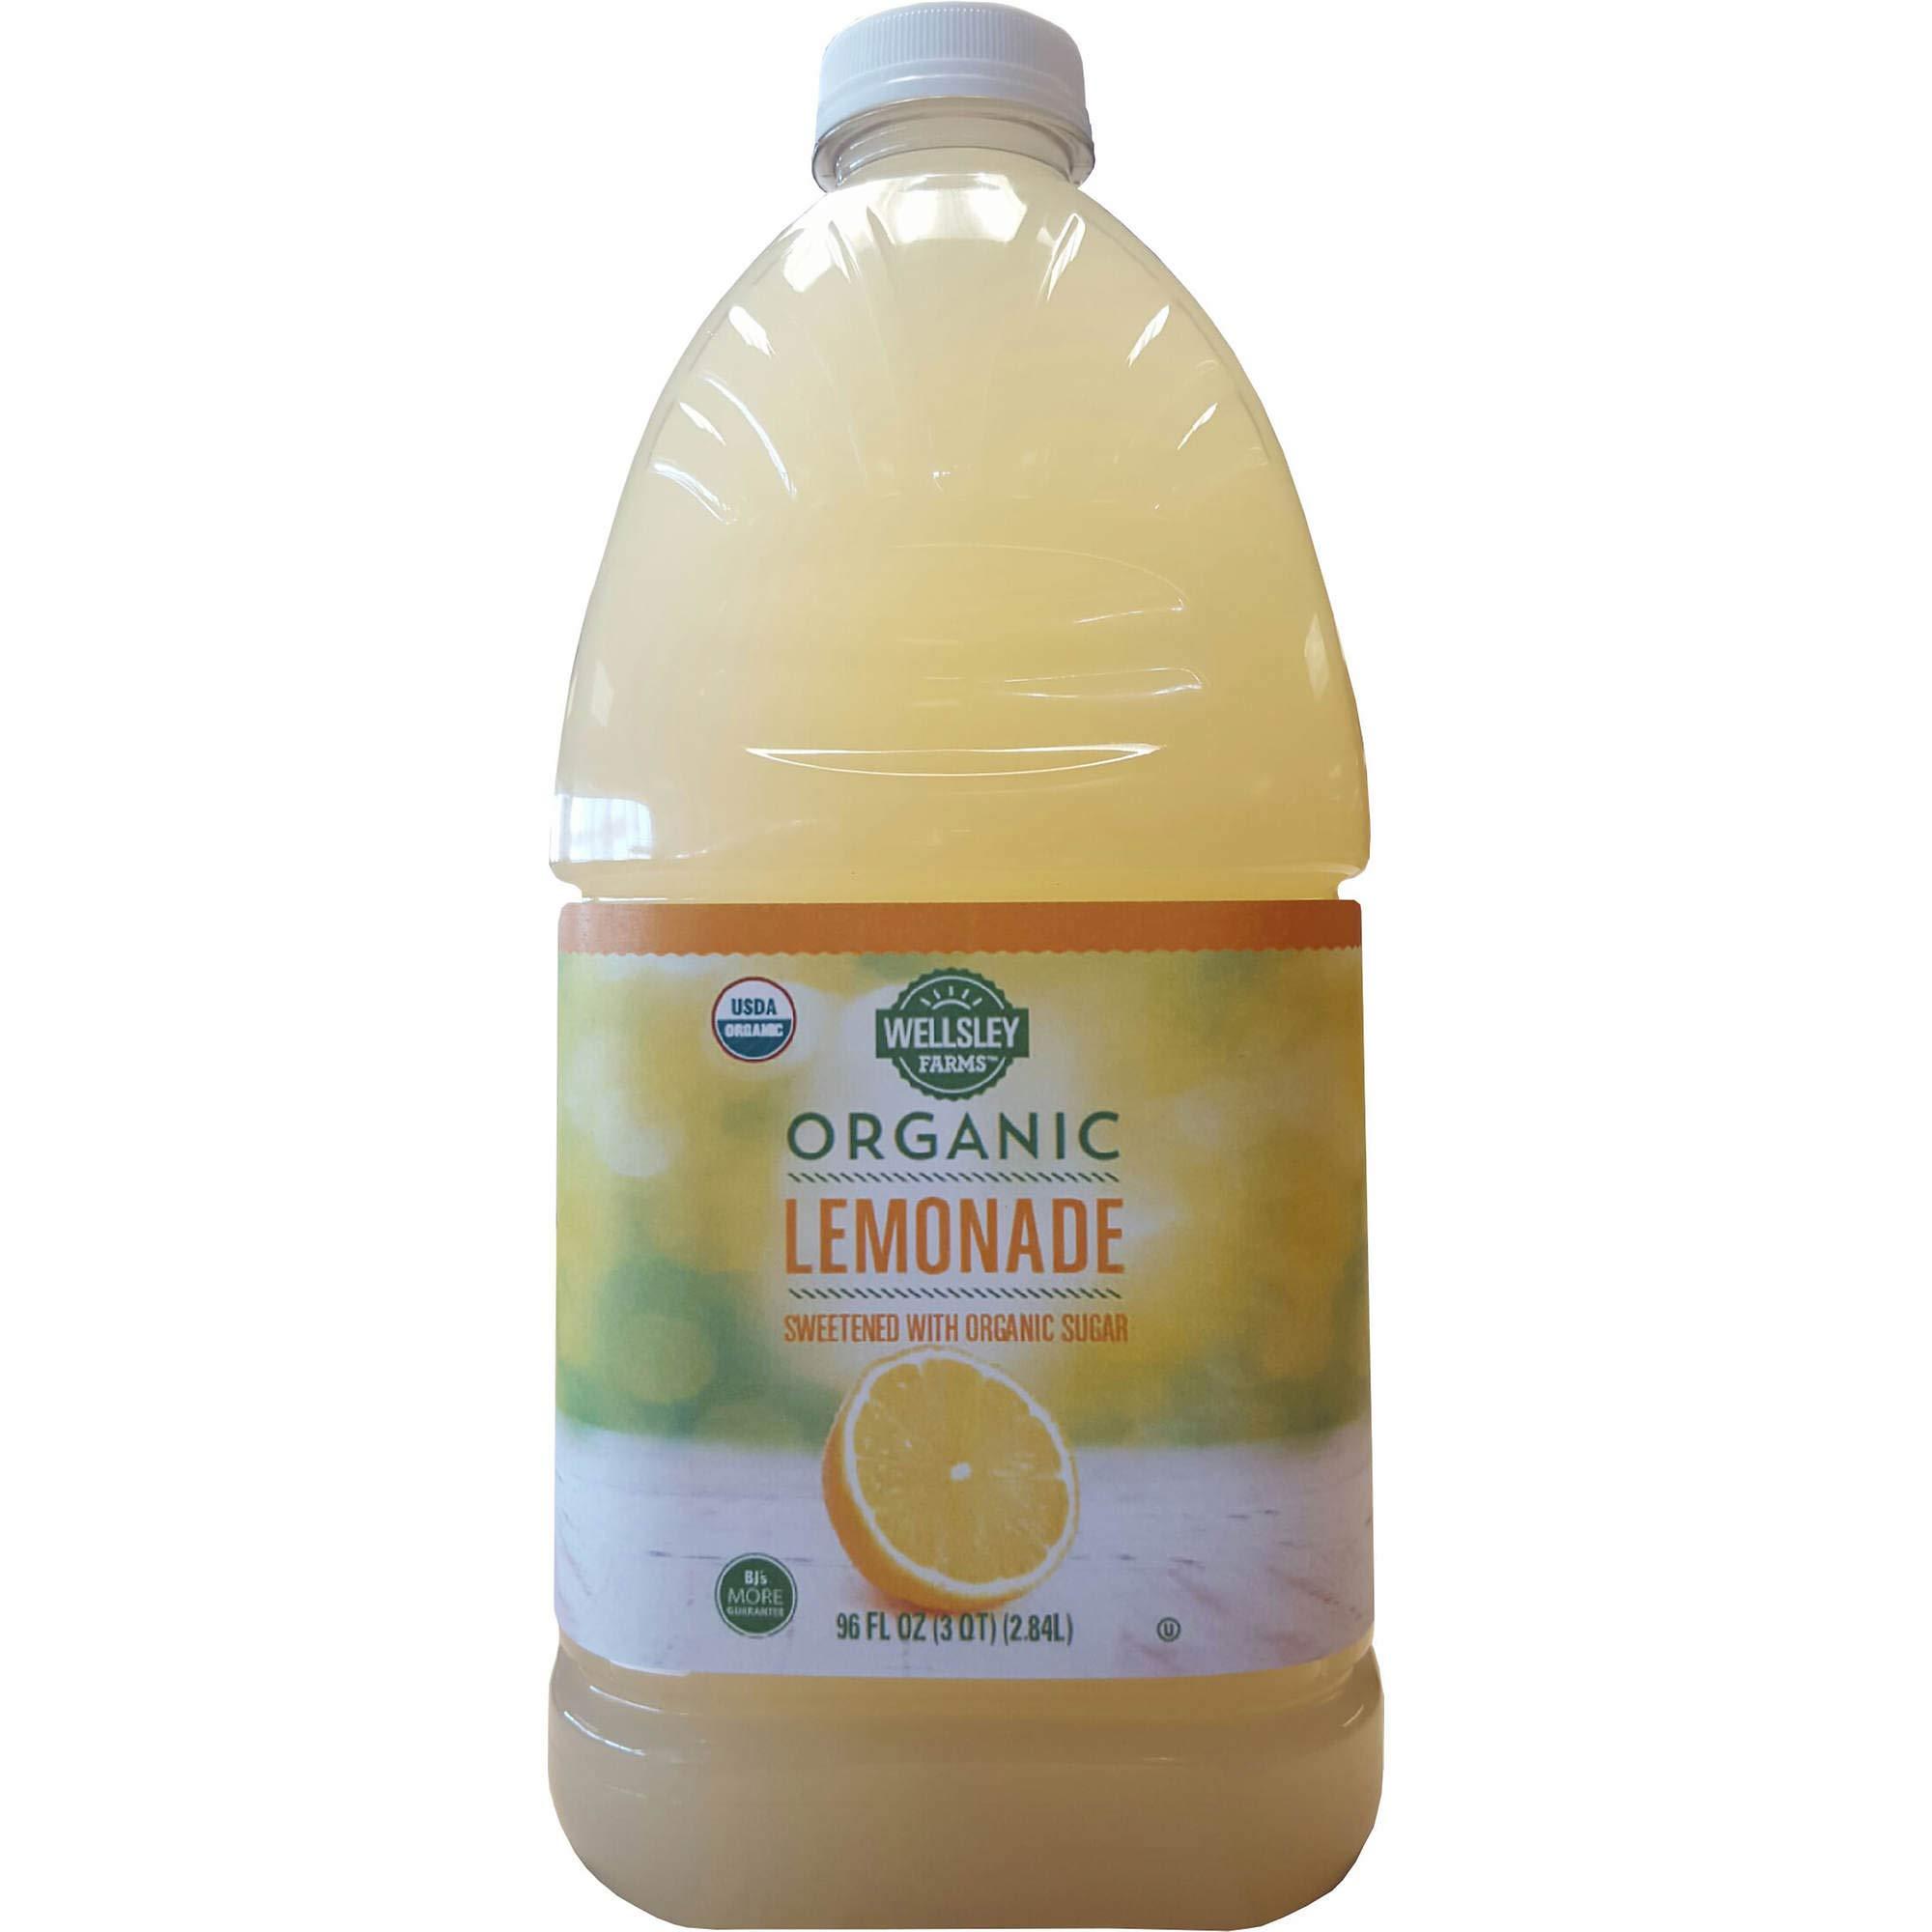 Wellsley Farms Expect More Organic Lemonade, 4 pk./96 oz.